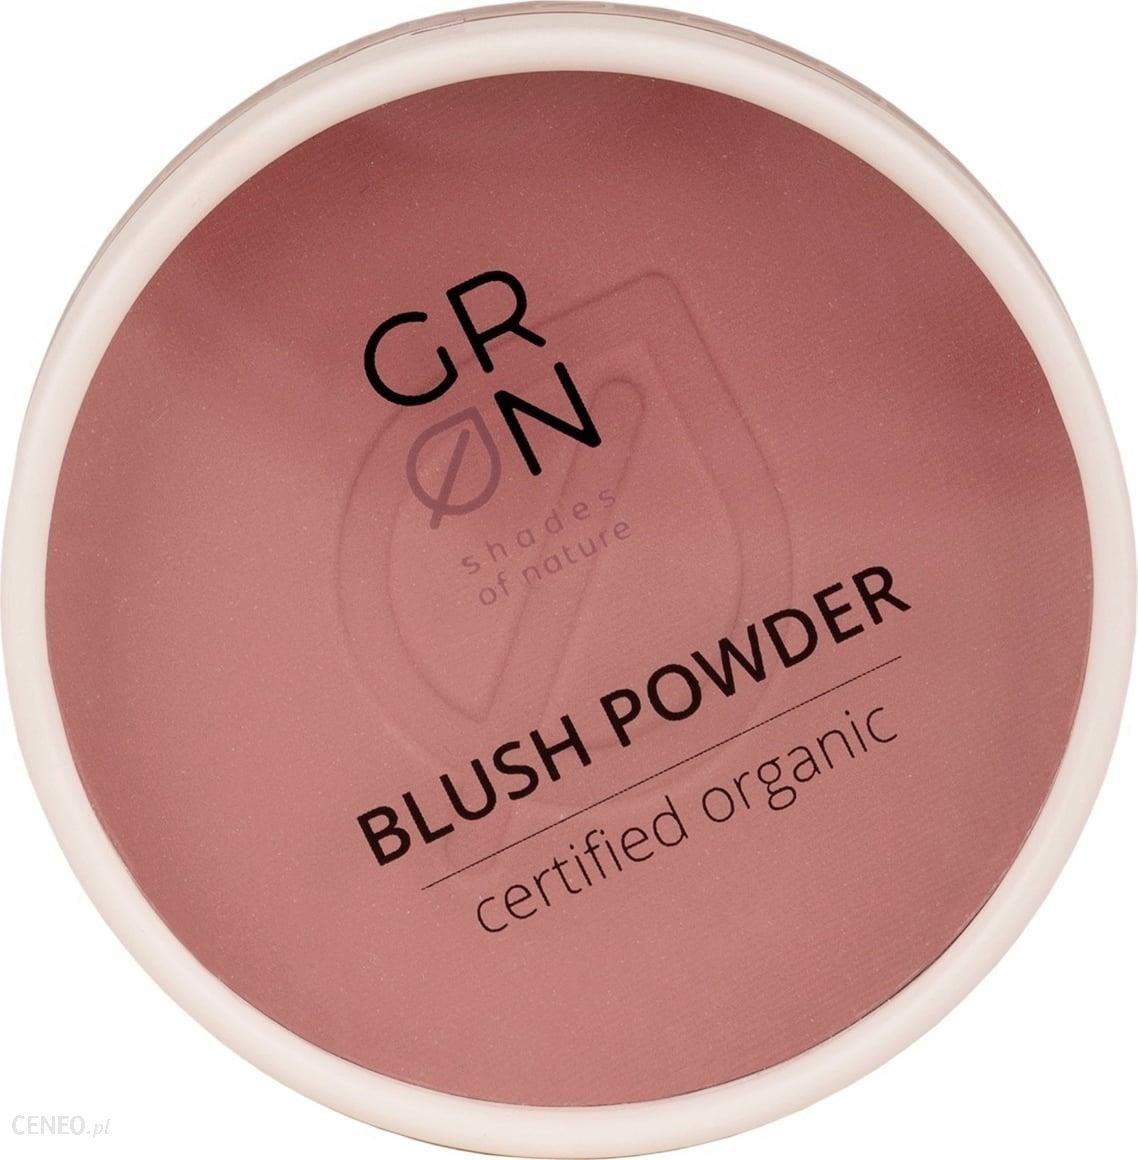 grn Blush Powder róż Rosewood